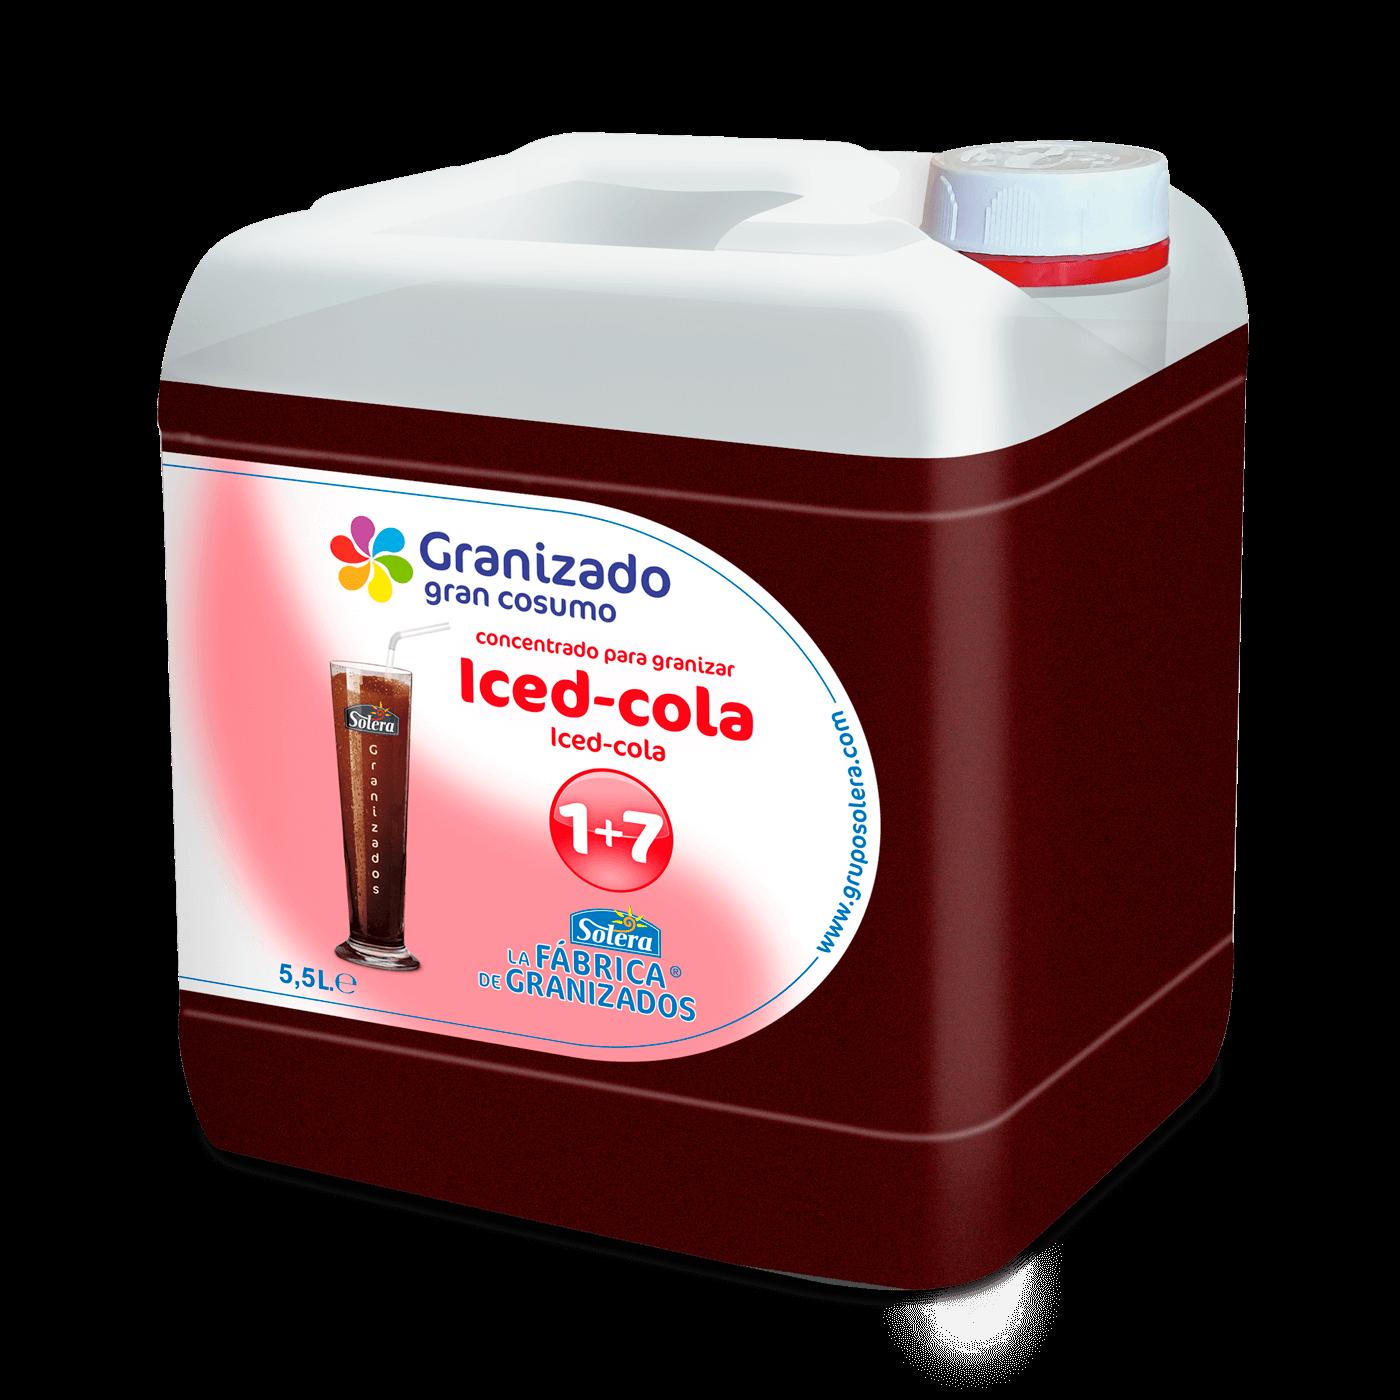 tanqueta iced-cola